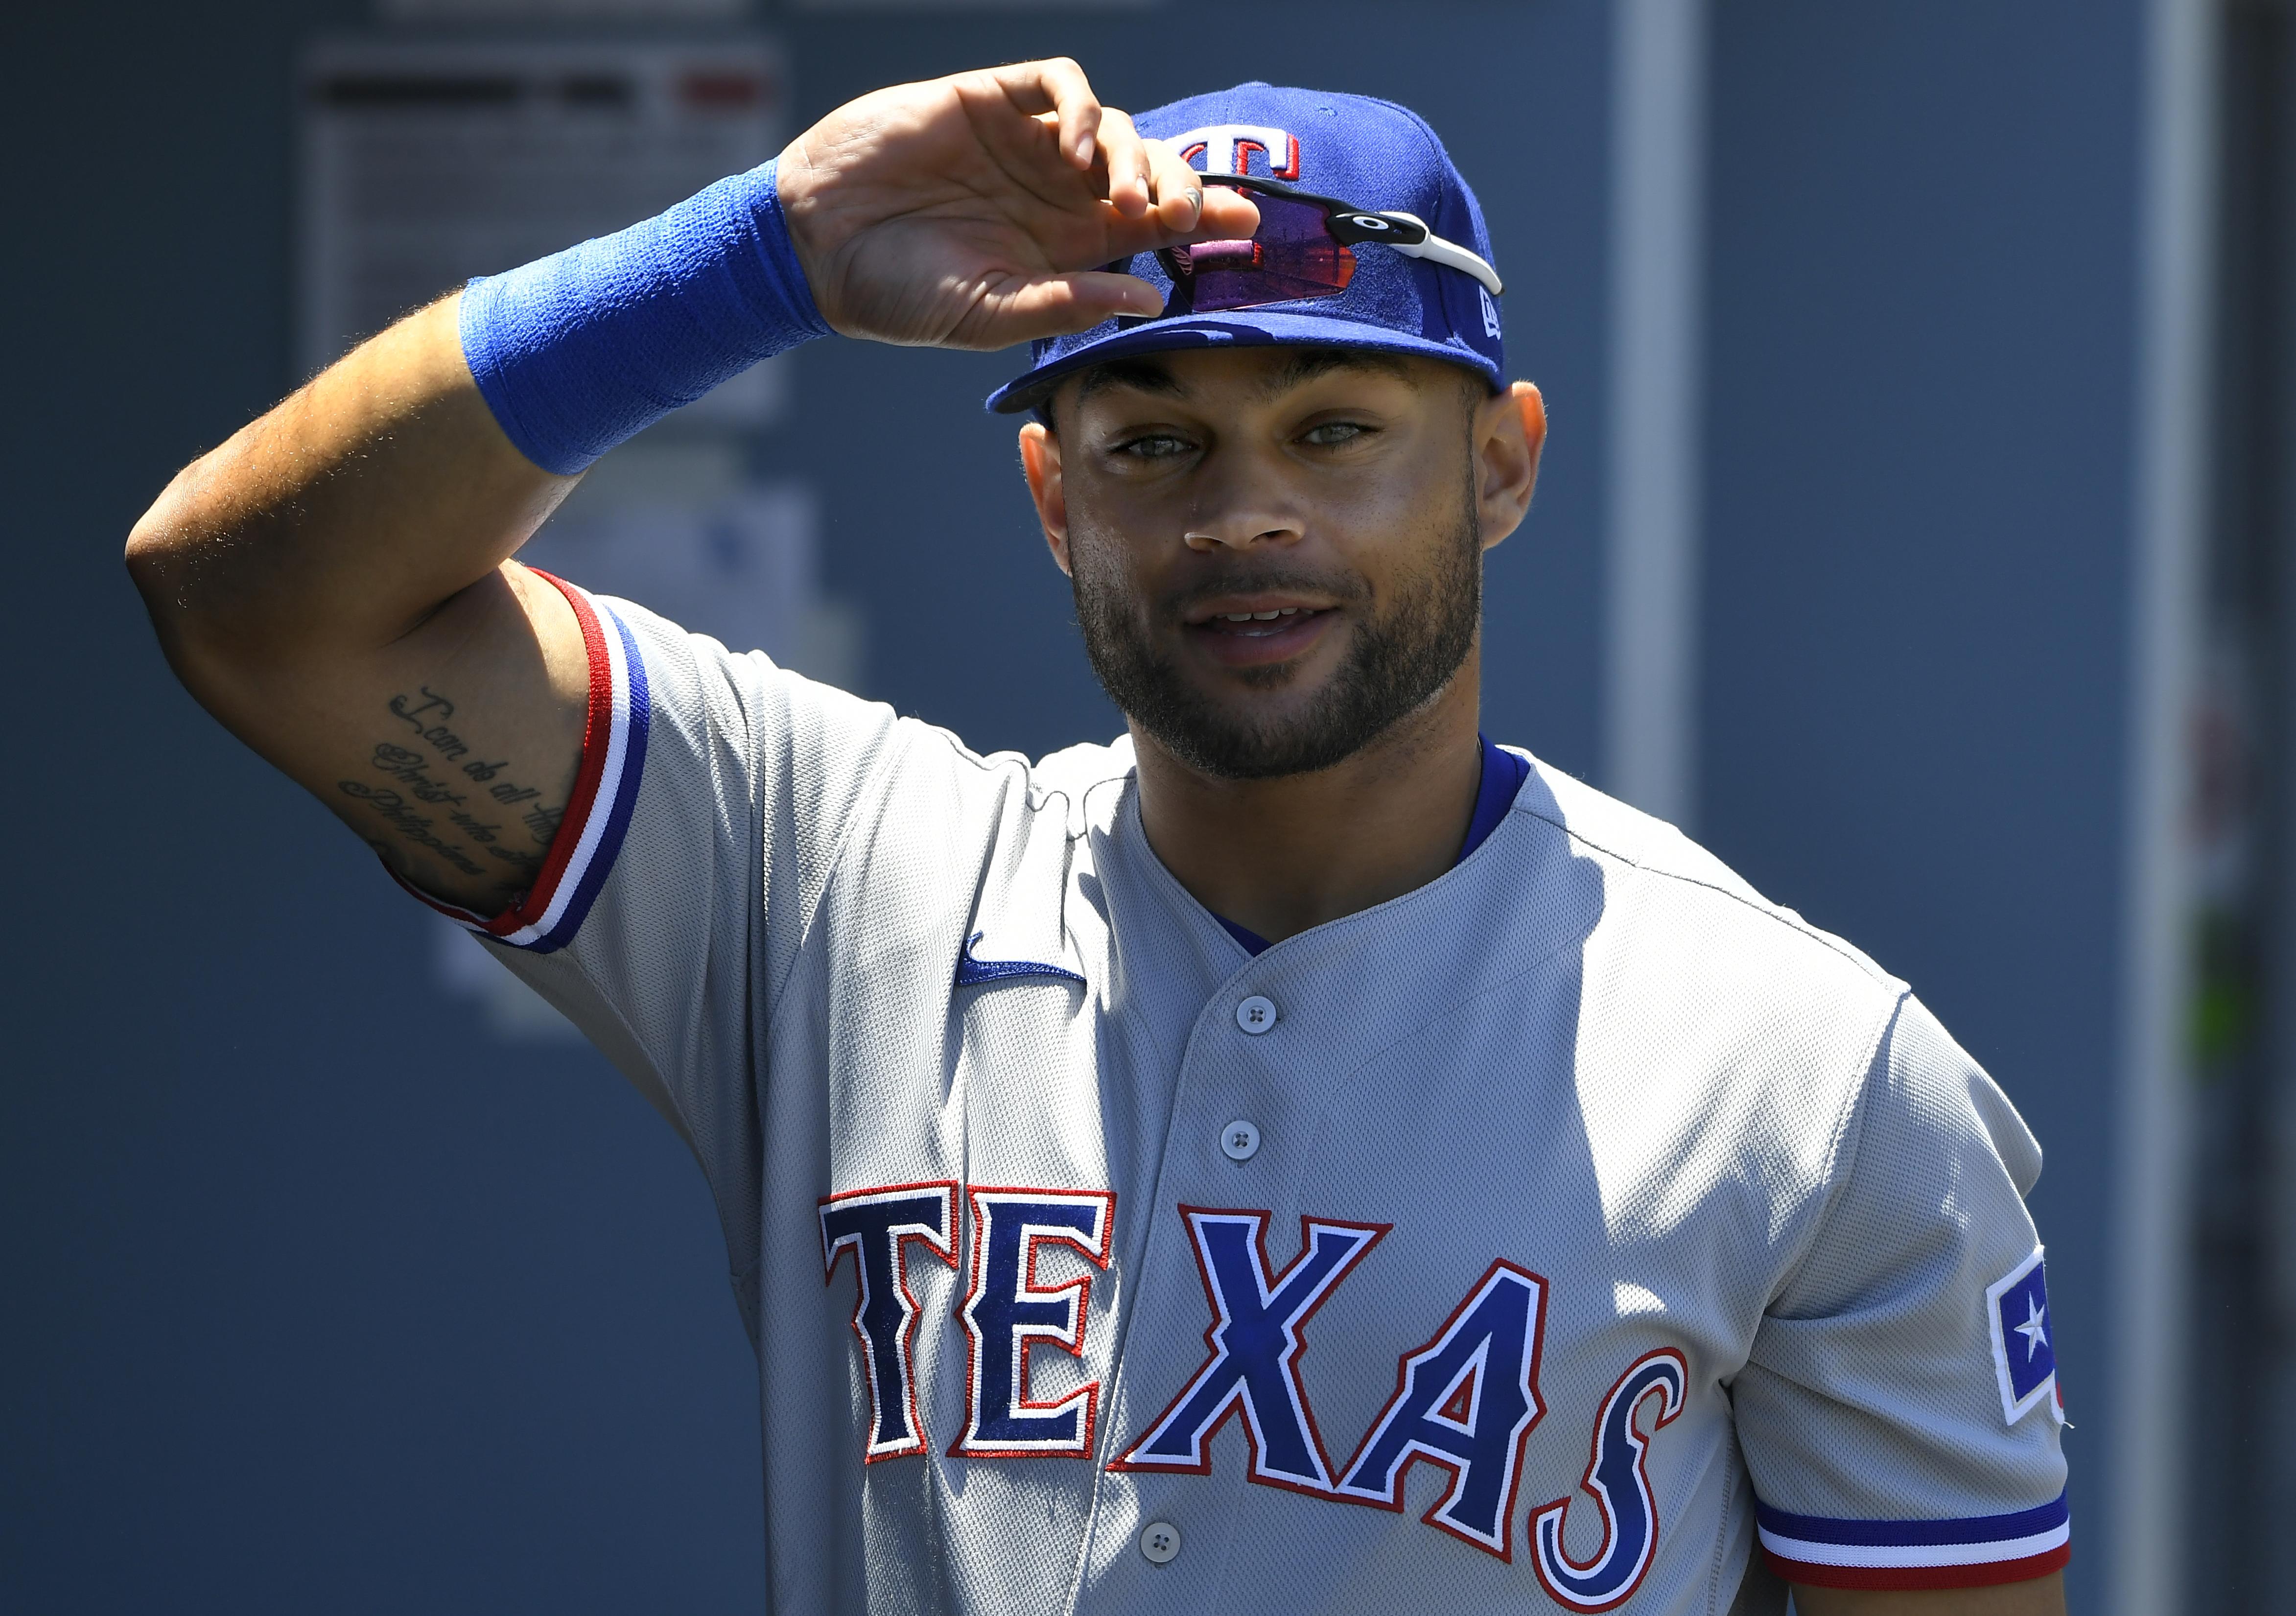 MLB: JUN 13 Rangers at Dodgers